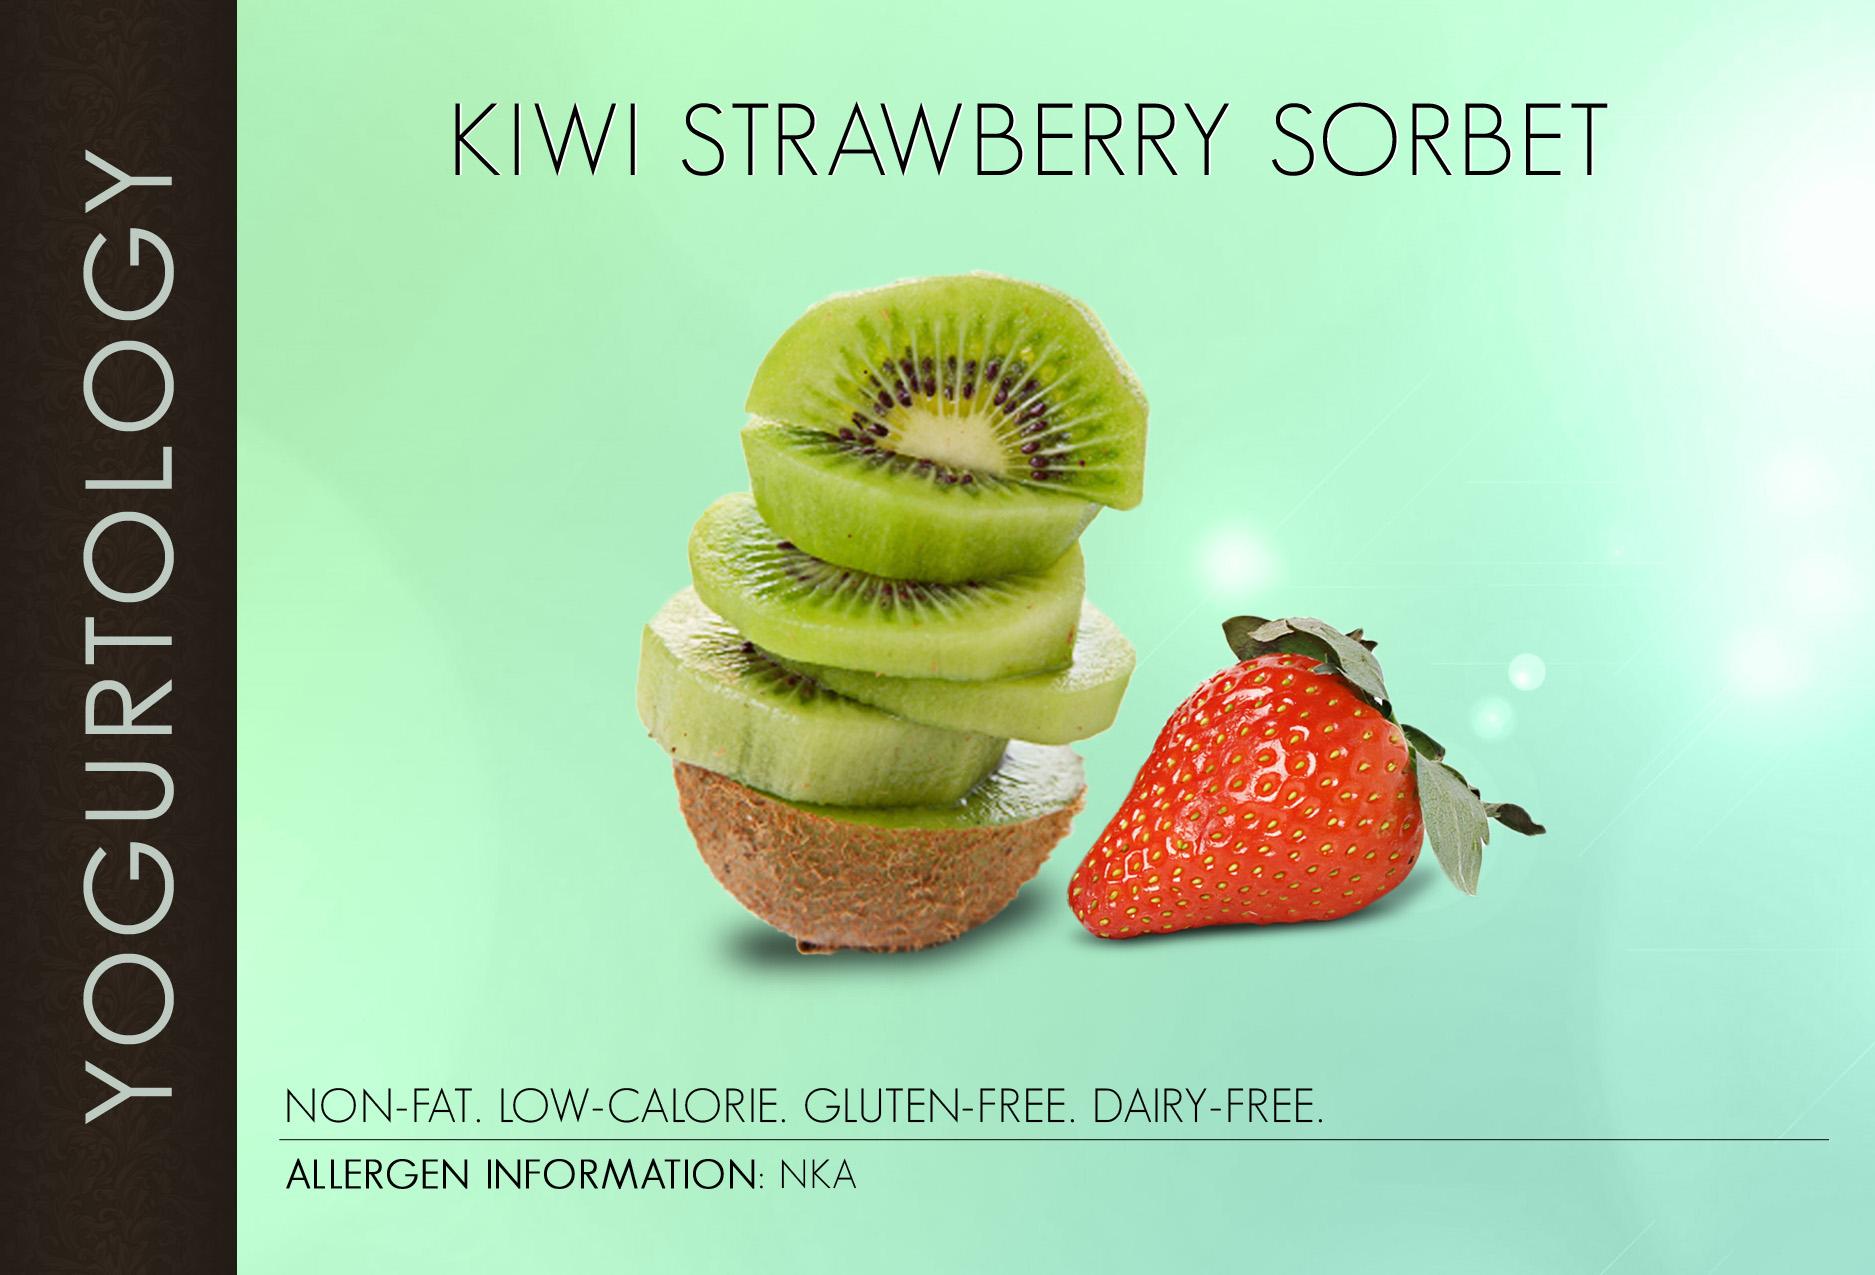 Kiwi Strawberry Sorbet